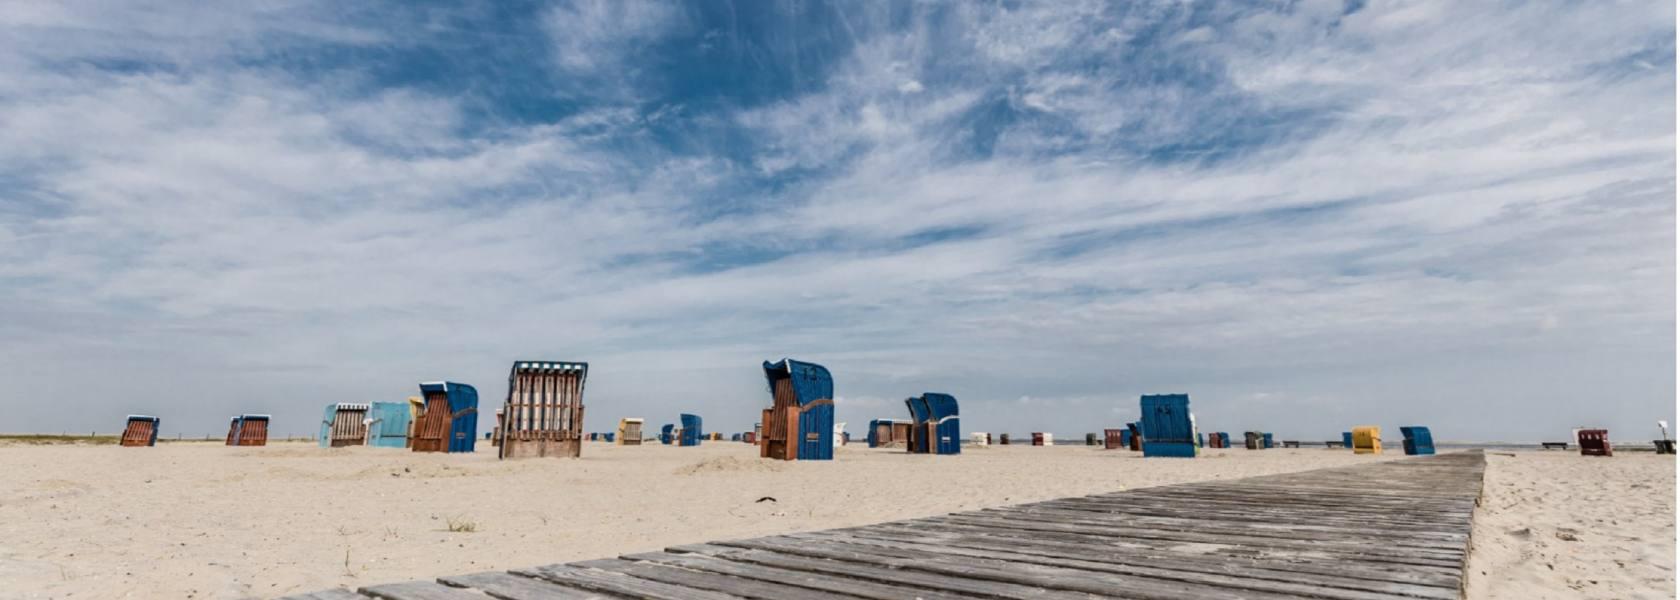 Strandweg im Dornumerland, © Lars Wehrmann